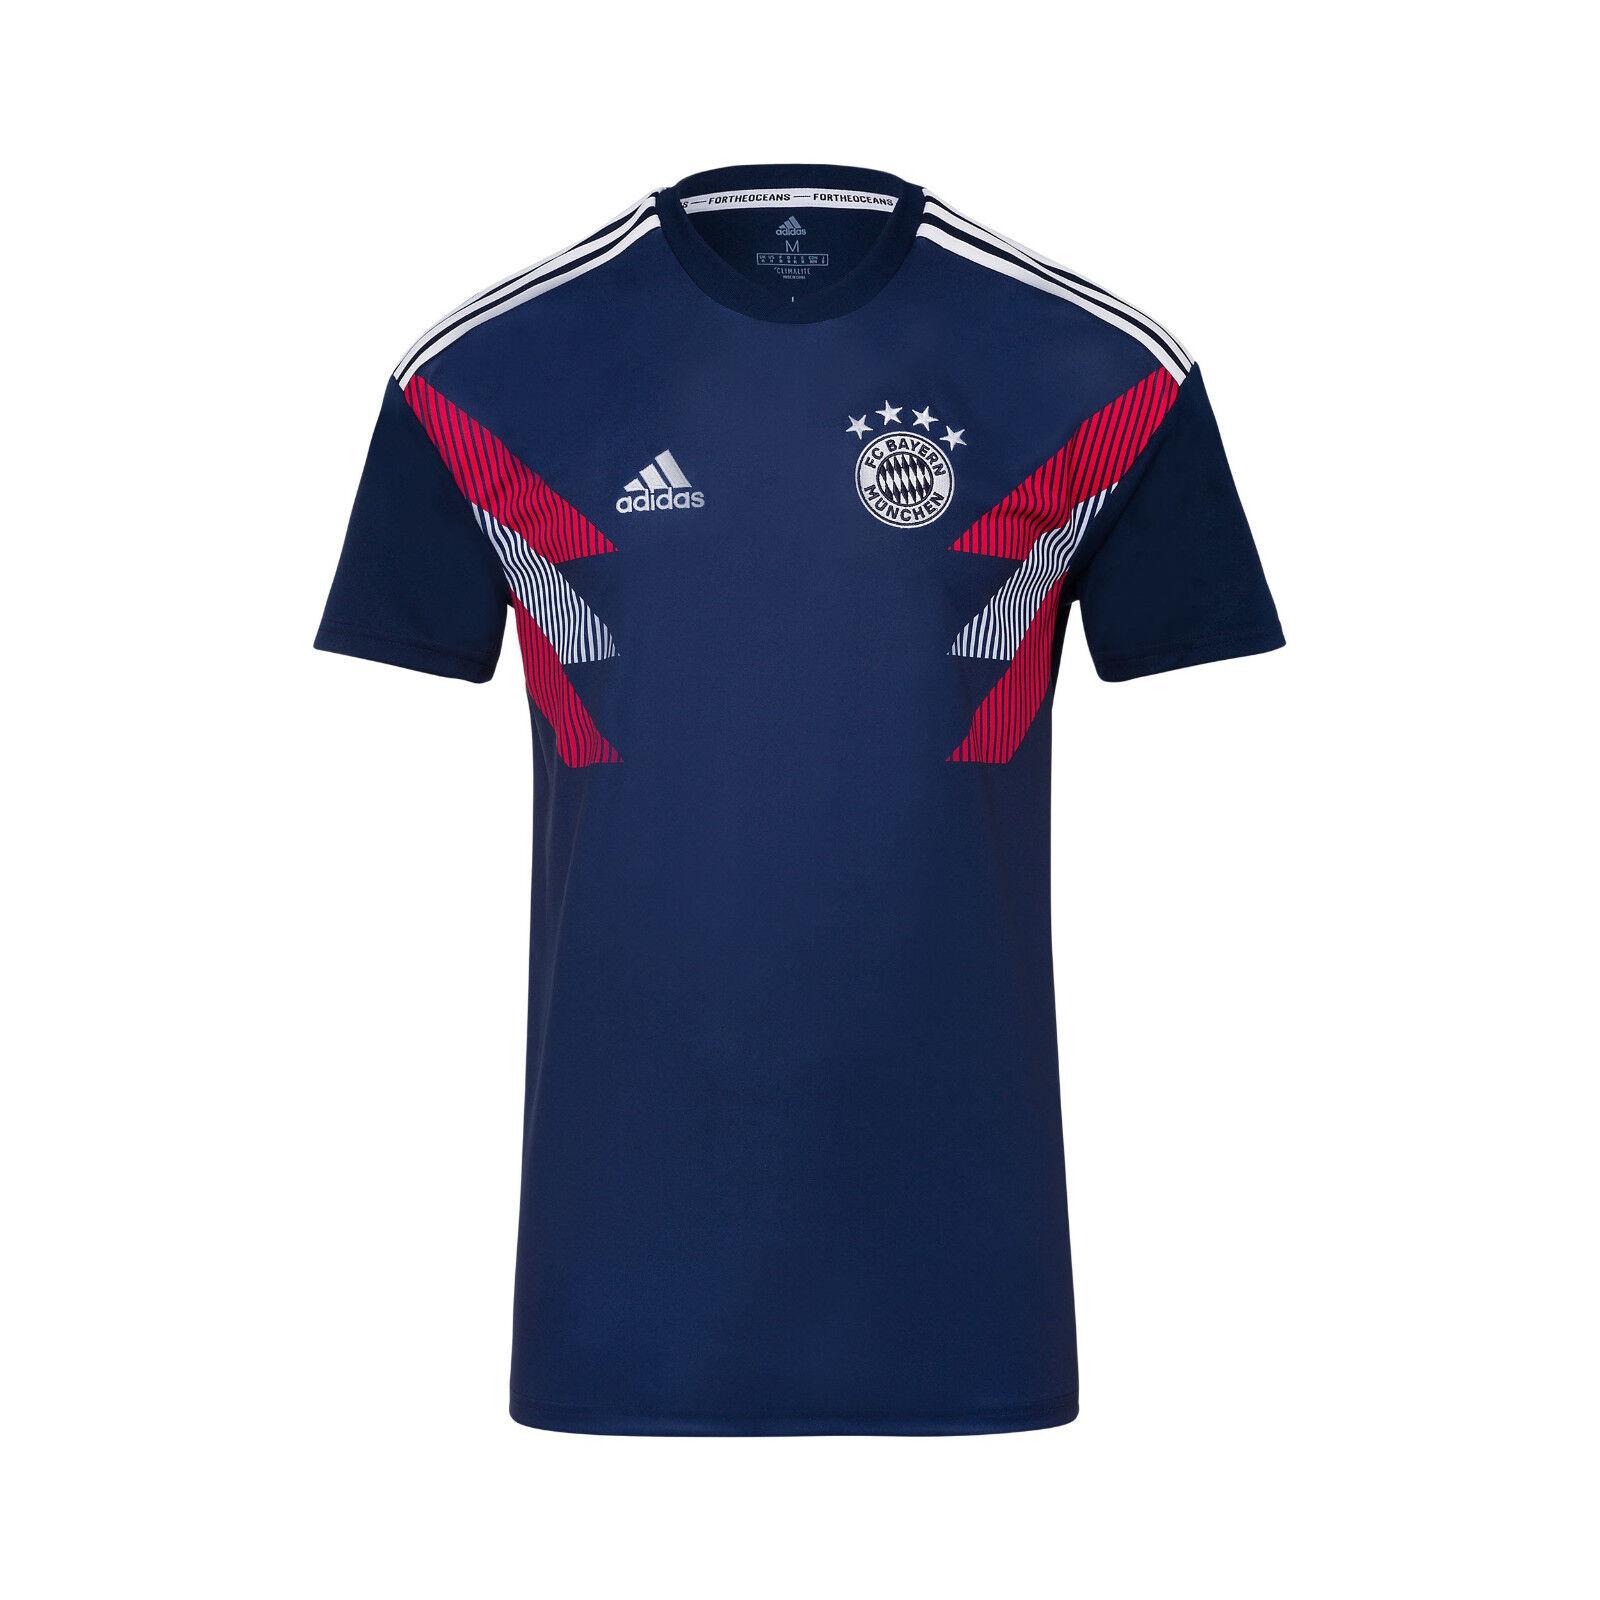 Original adidas FCB FC Bayern München München München Kinder Pre-Match Shirt 2a7bff